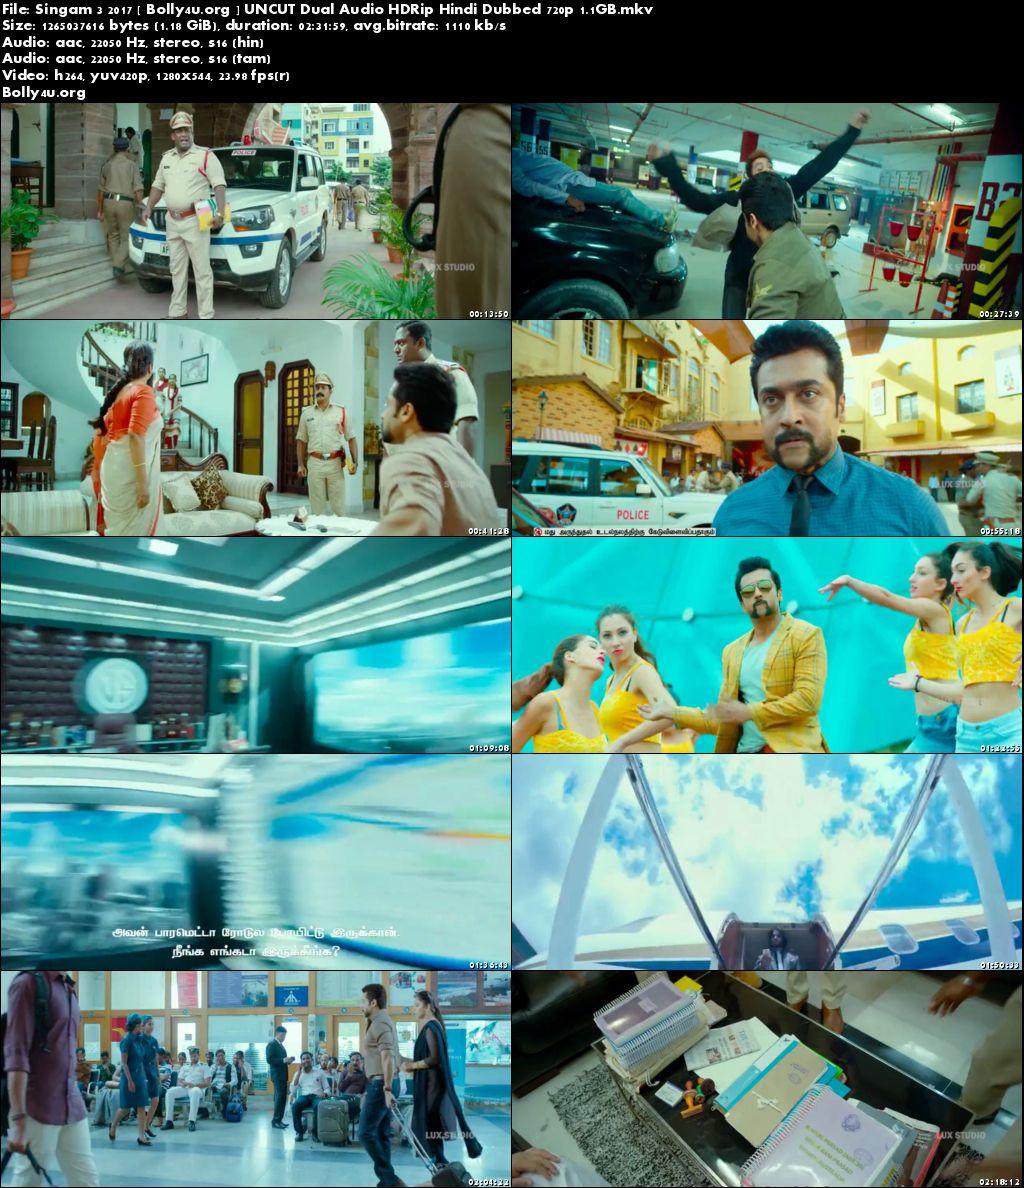 Singam 3 2017 HDRip UNCUT Hindi Dual Audio 720p Download